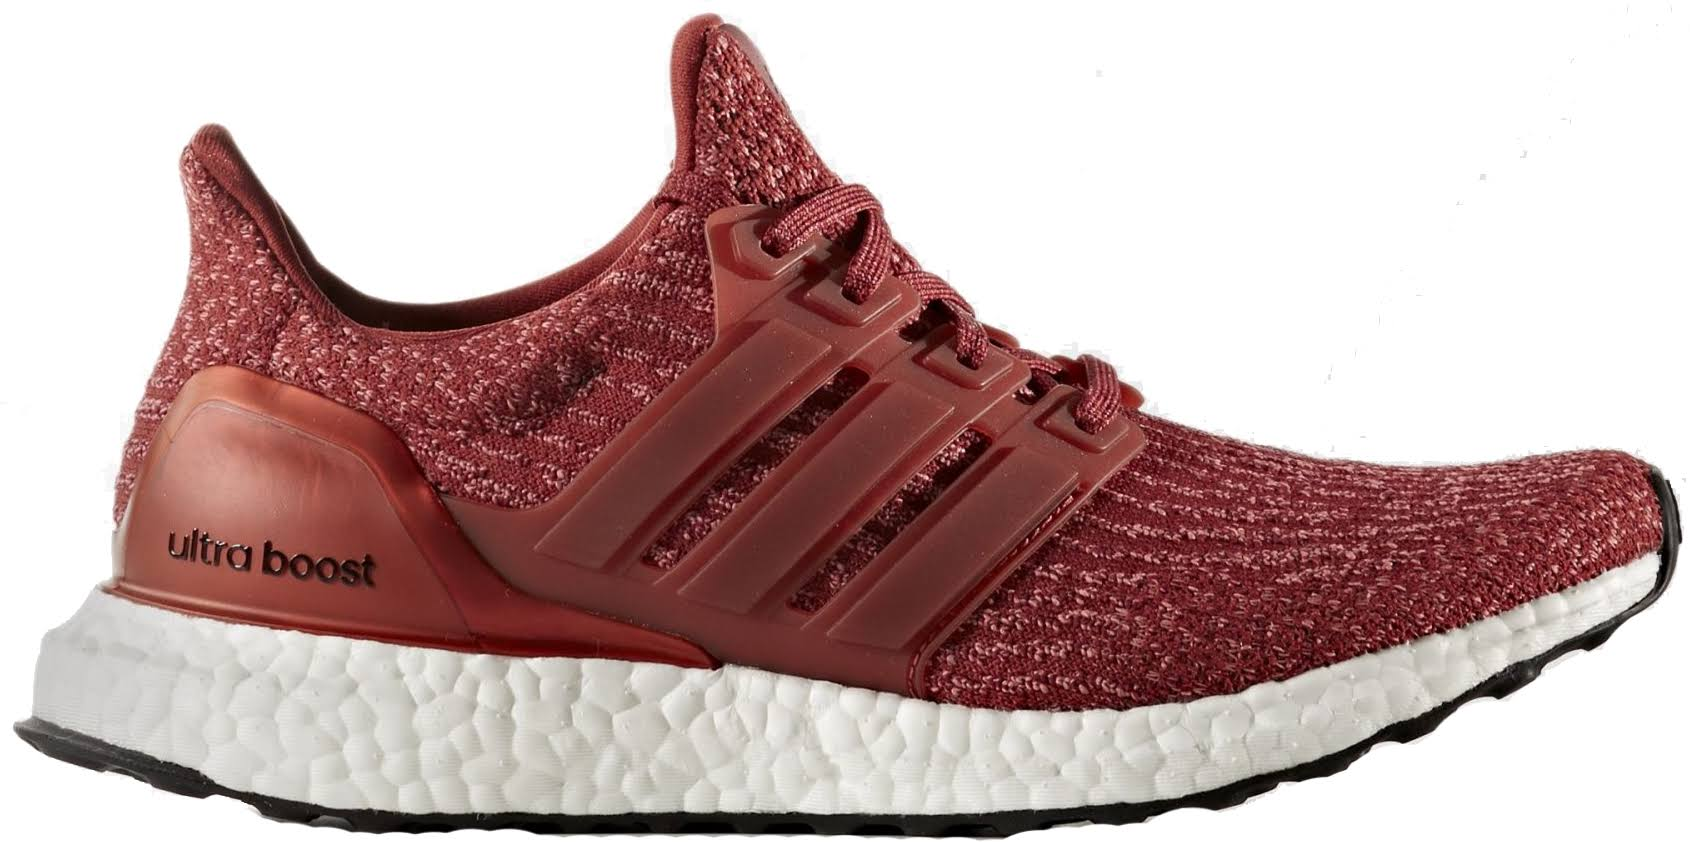 Adidas Ultra Boost 3.0 Mystery Red (w)